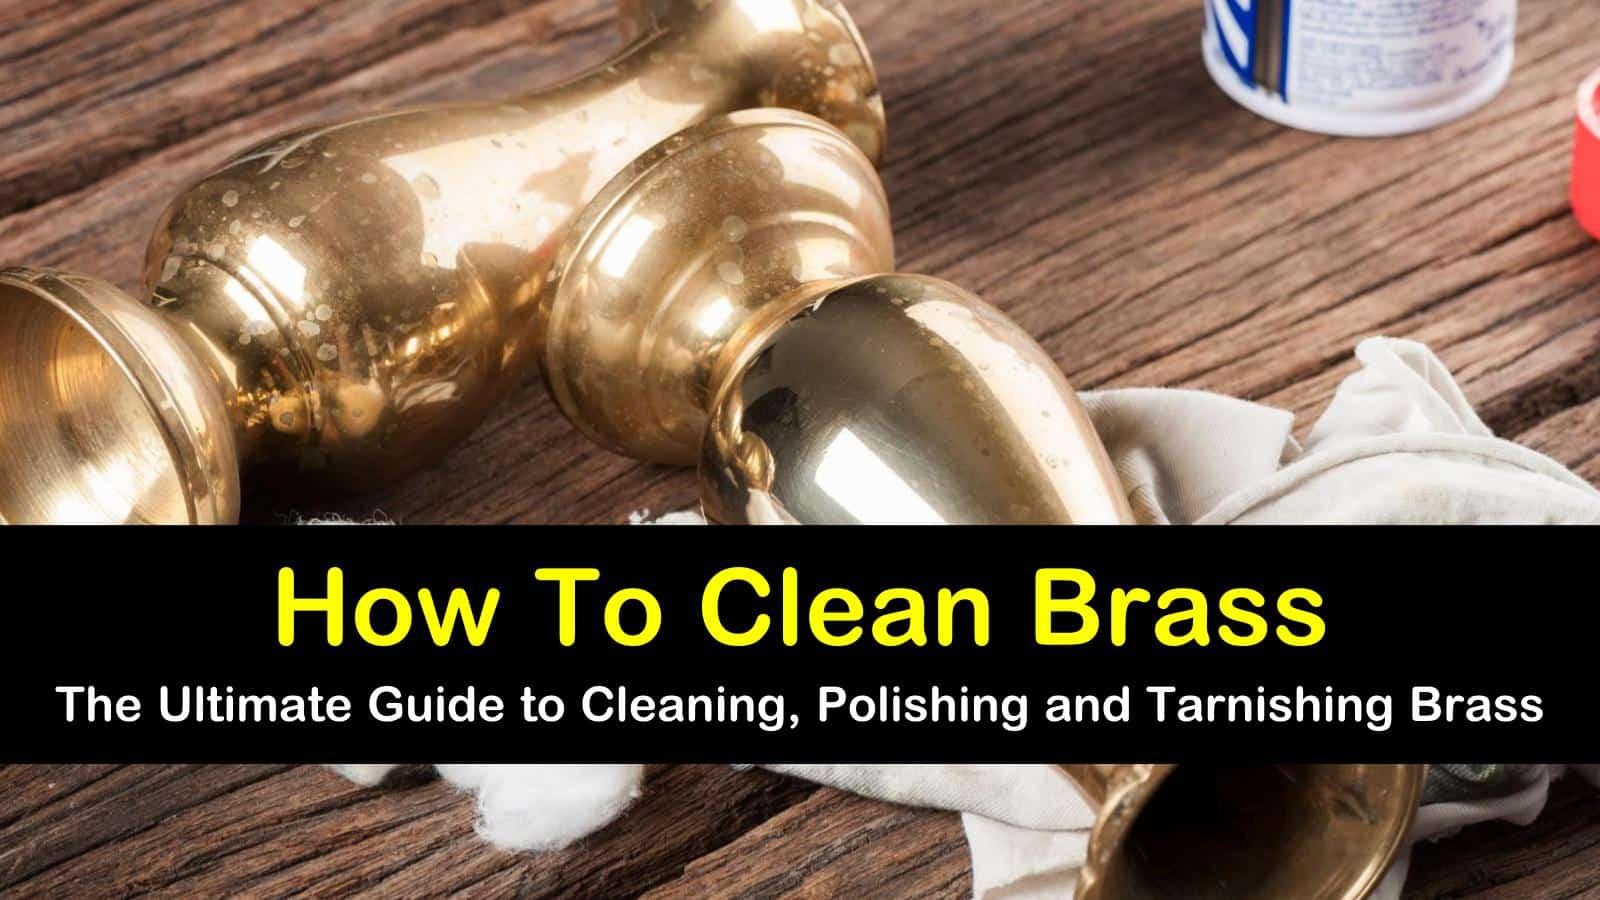 10 Smart Easy Ways To Clean Brass